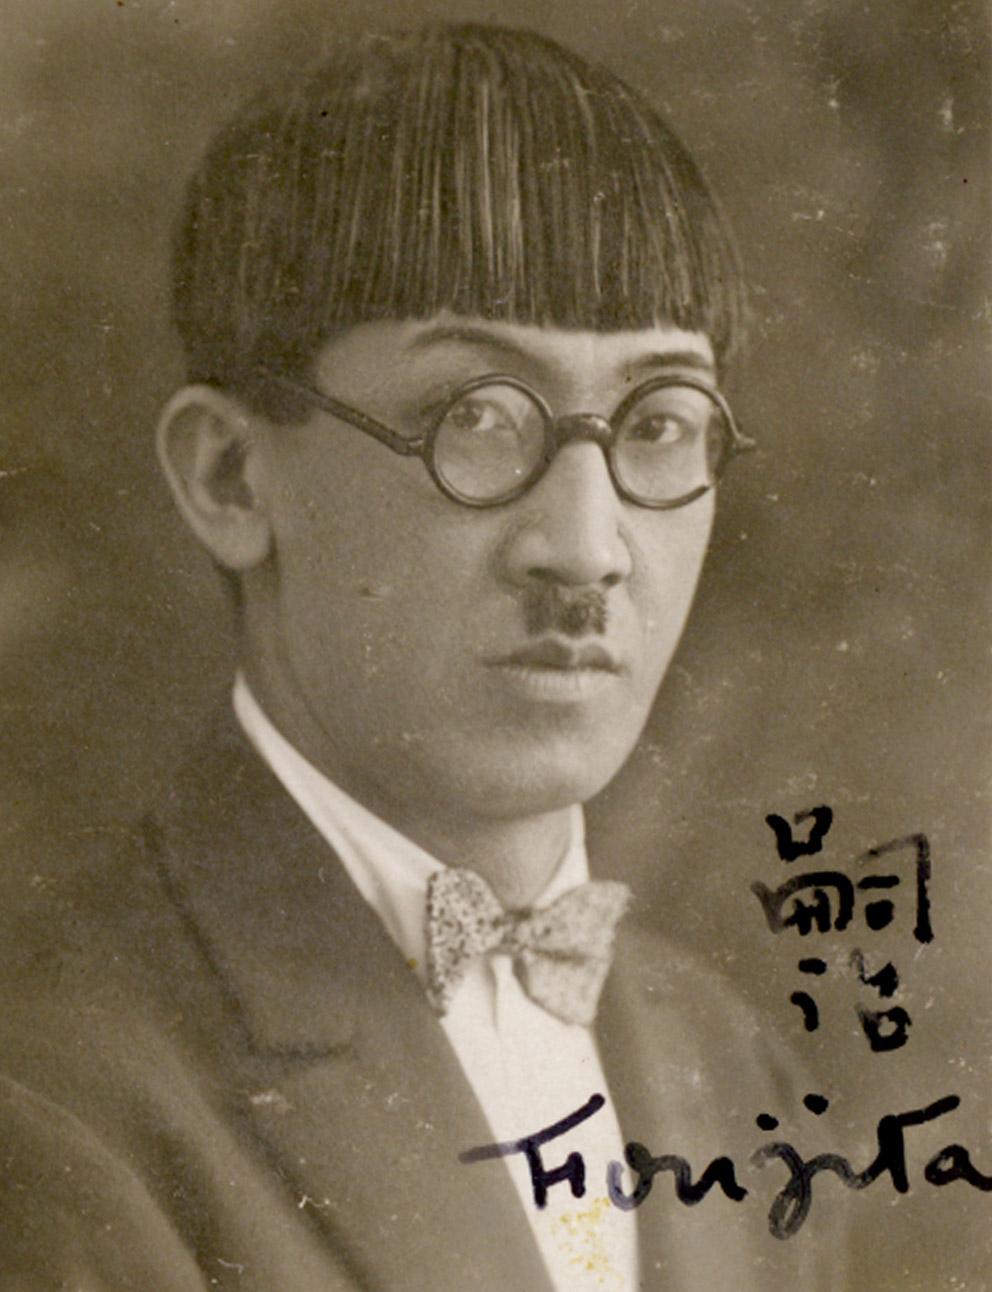 Portrait de Léonard Foujita, 1922